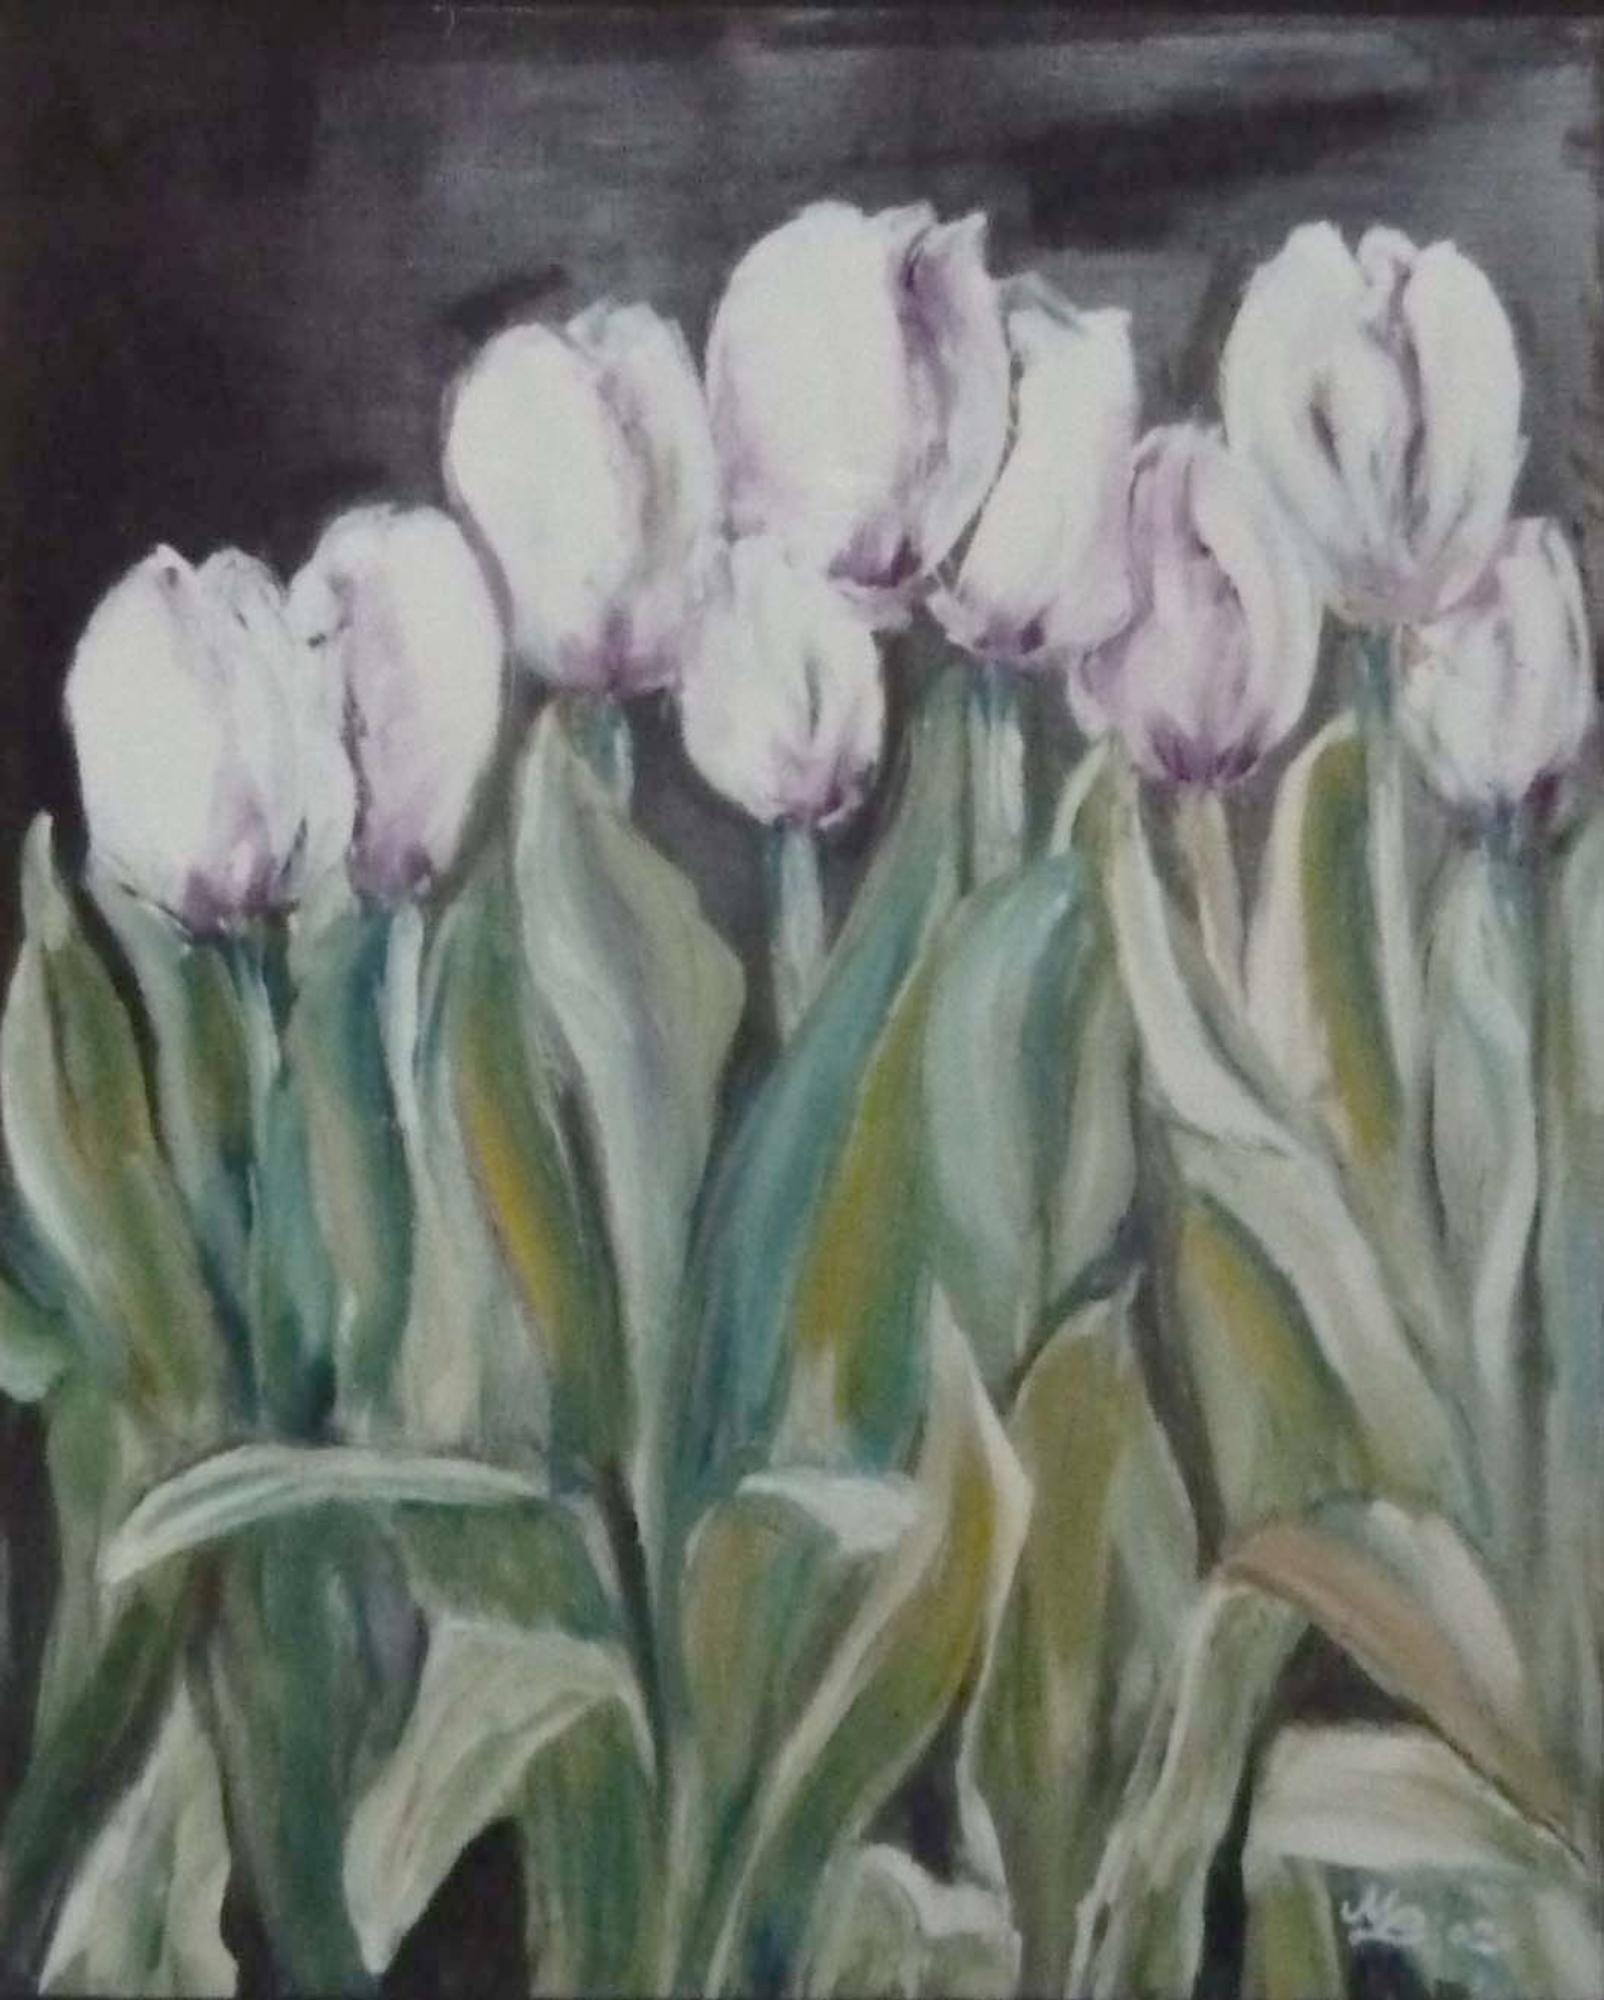 2009 - Weiße Tulpen, 50x60cm, Acryl